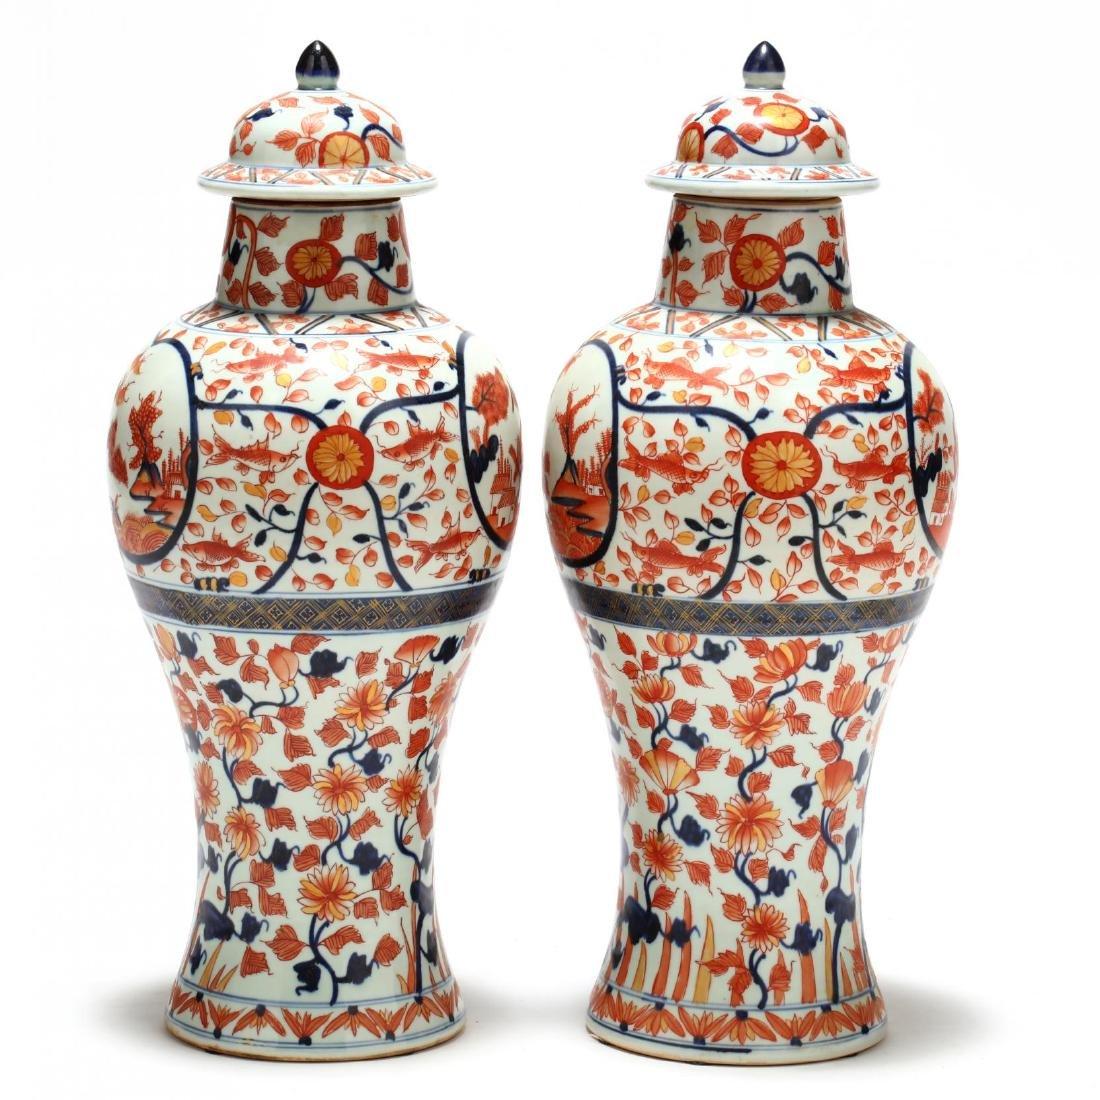 A Pair of Japanese Imari Covered Jars - 3